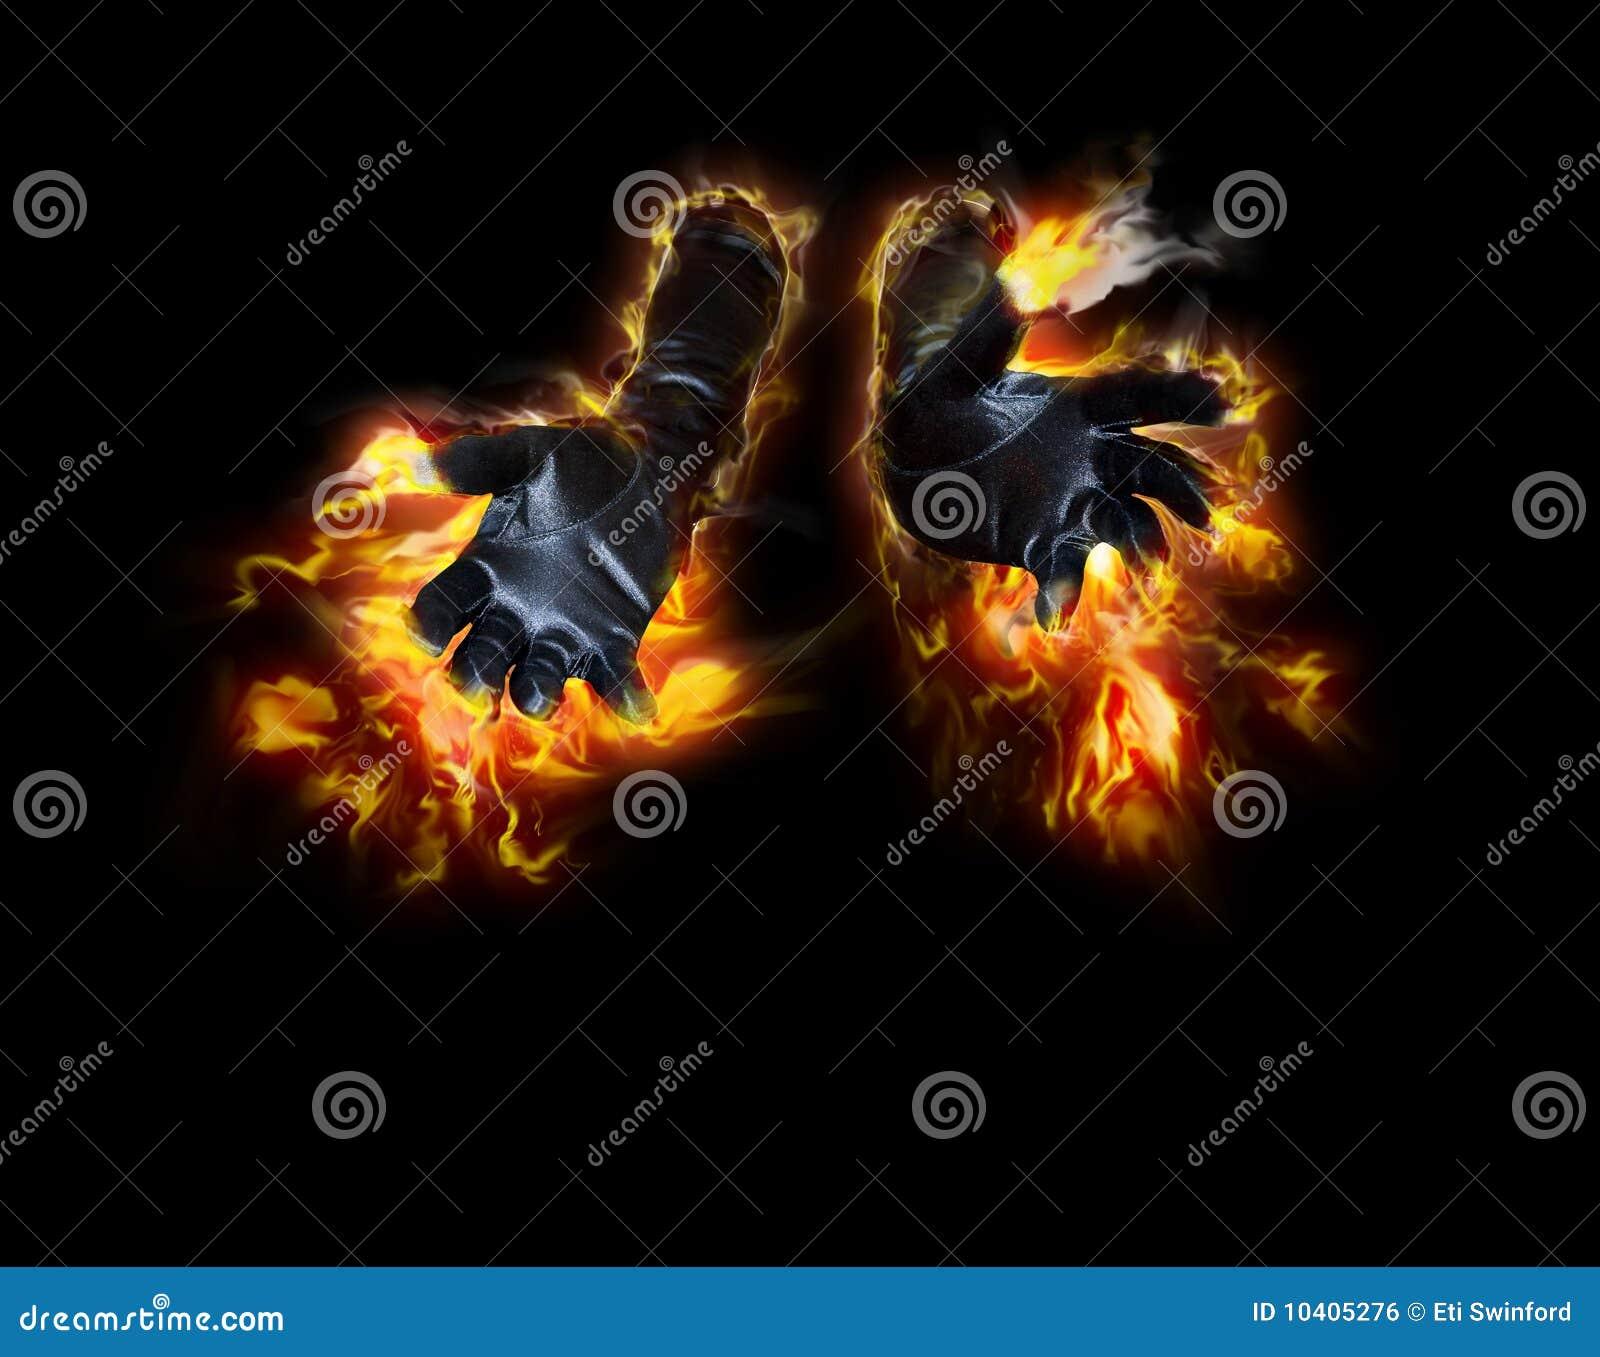 Steek handen in brand